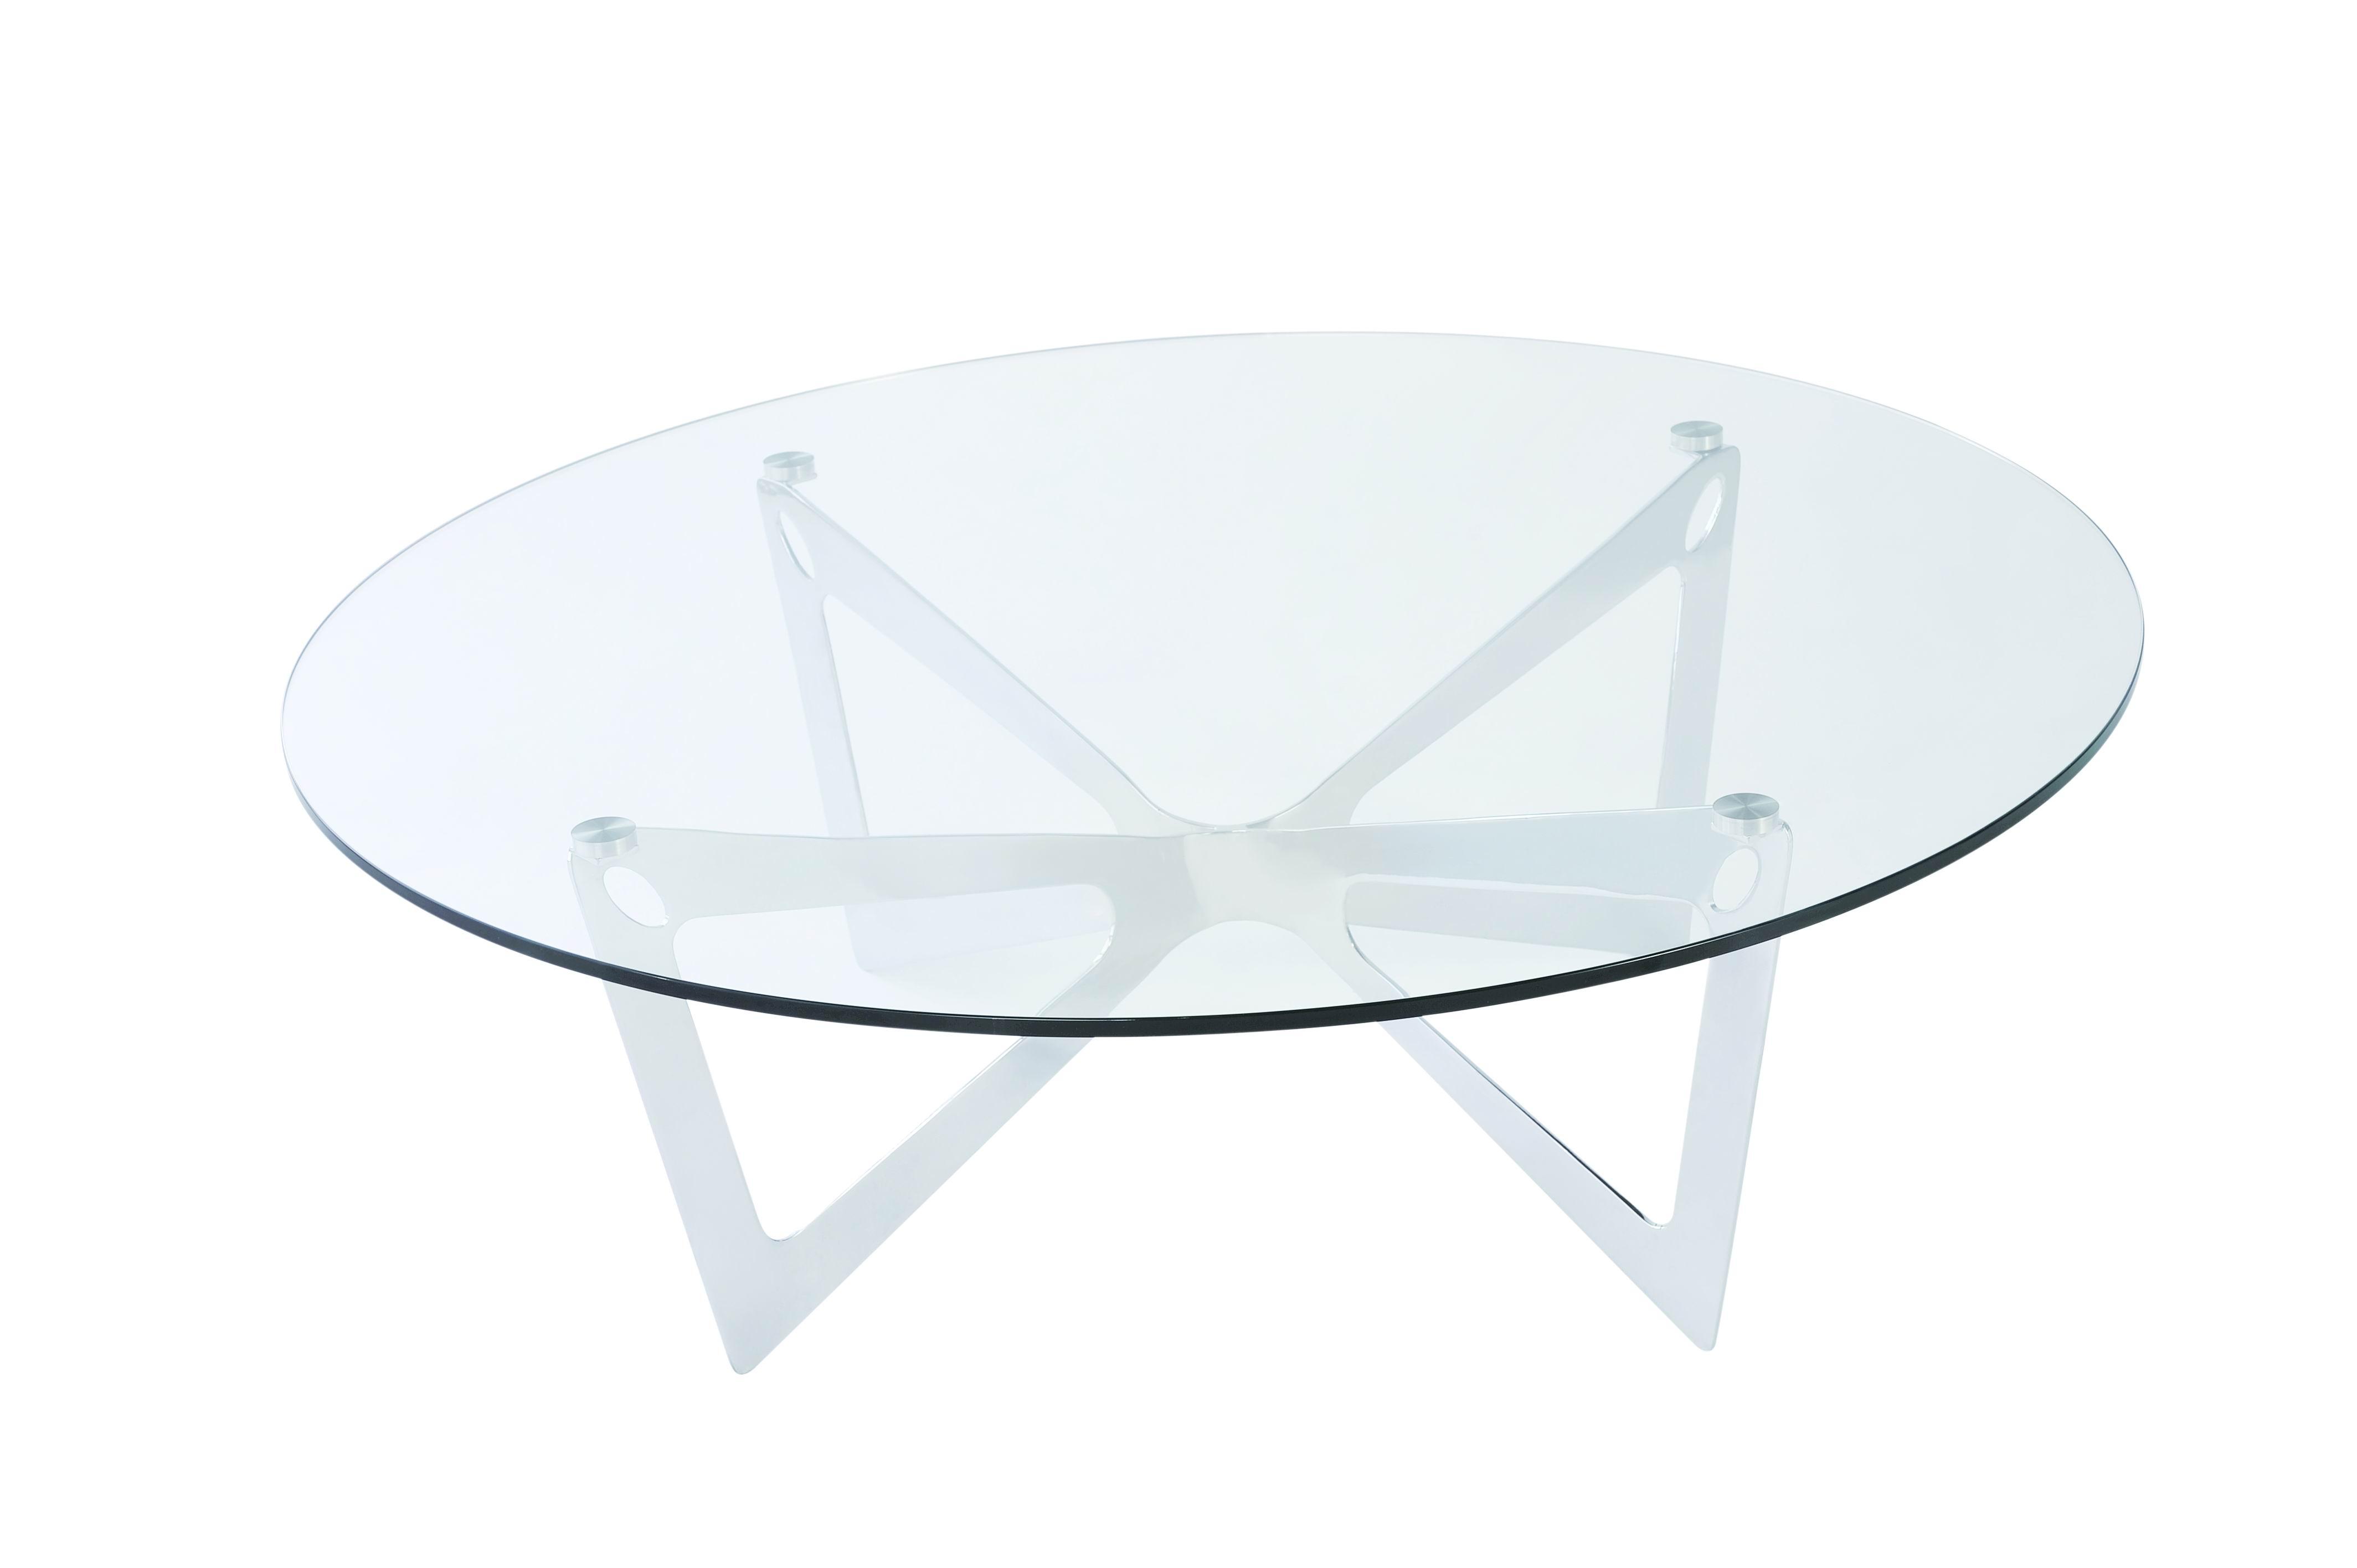 glass coffee table design classic photo - 2